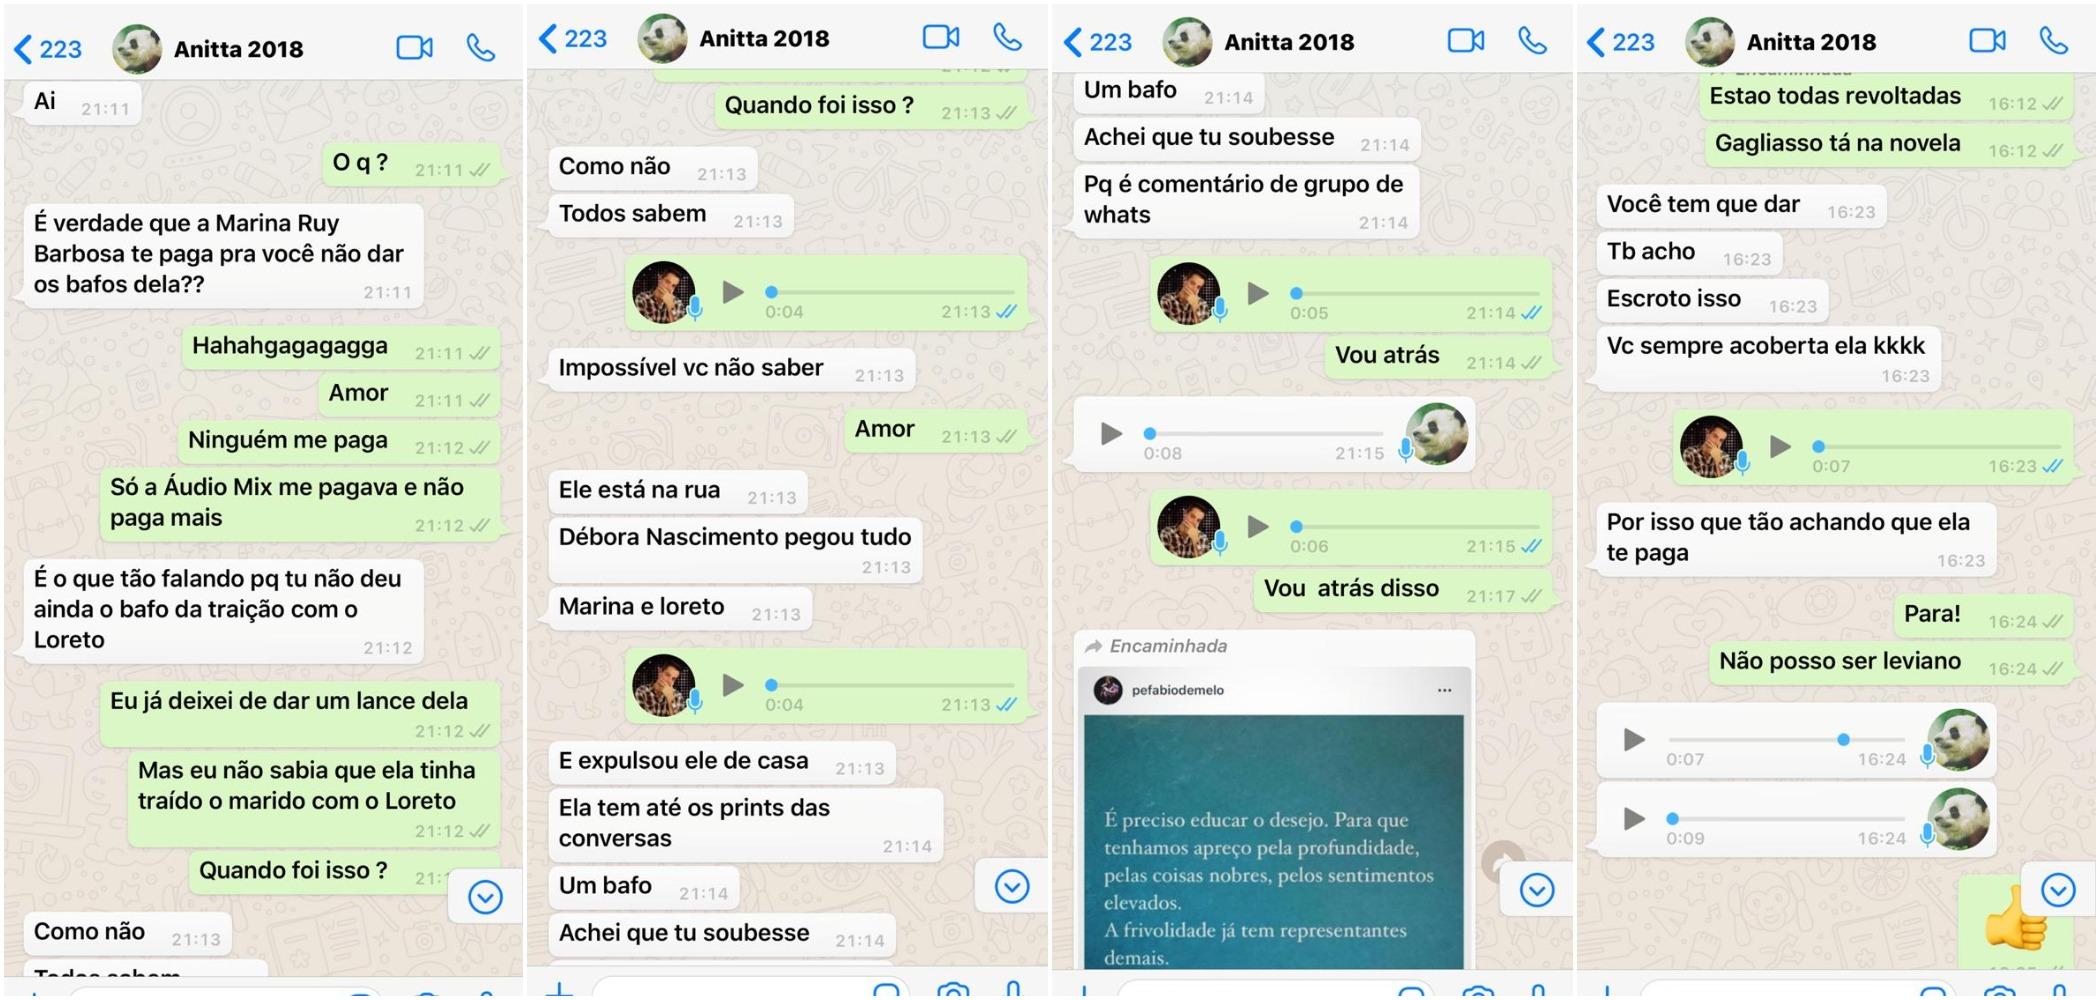 Prints das conversas entre Leo Dias e Anitta sobre Marina Ruy Barbosa - preta gil ivete sangalo